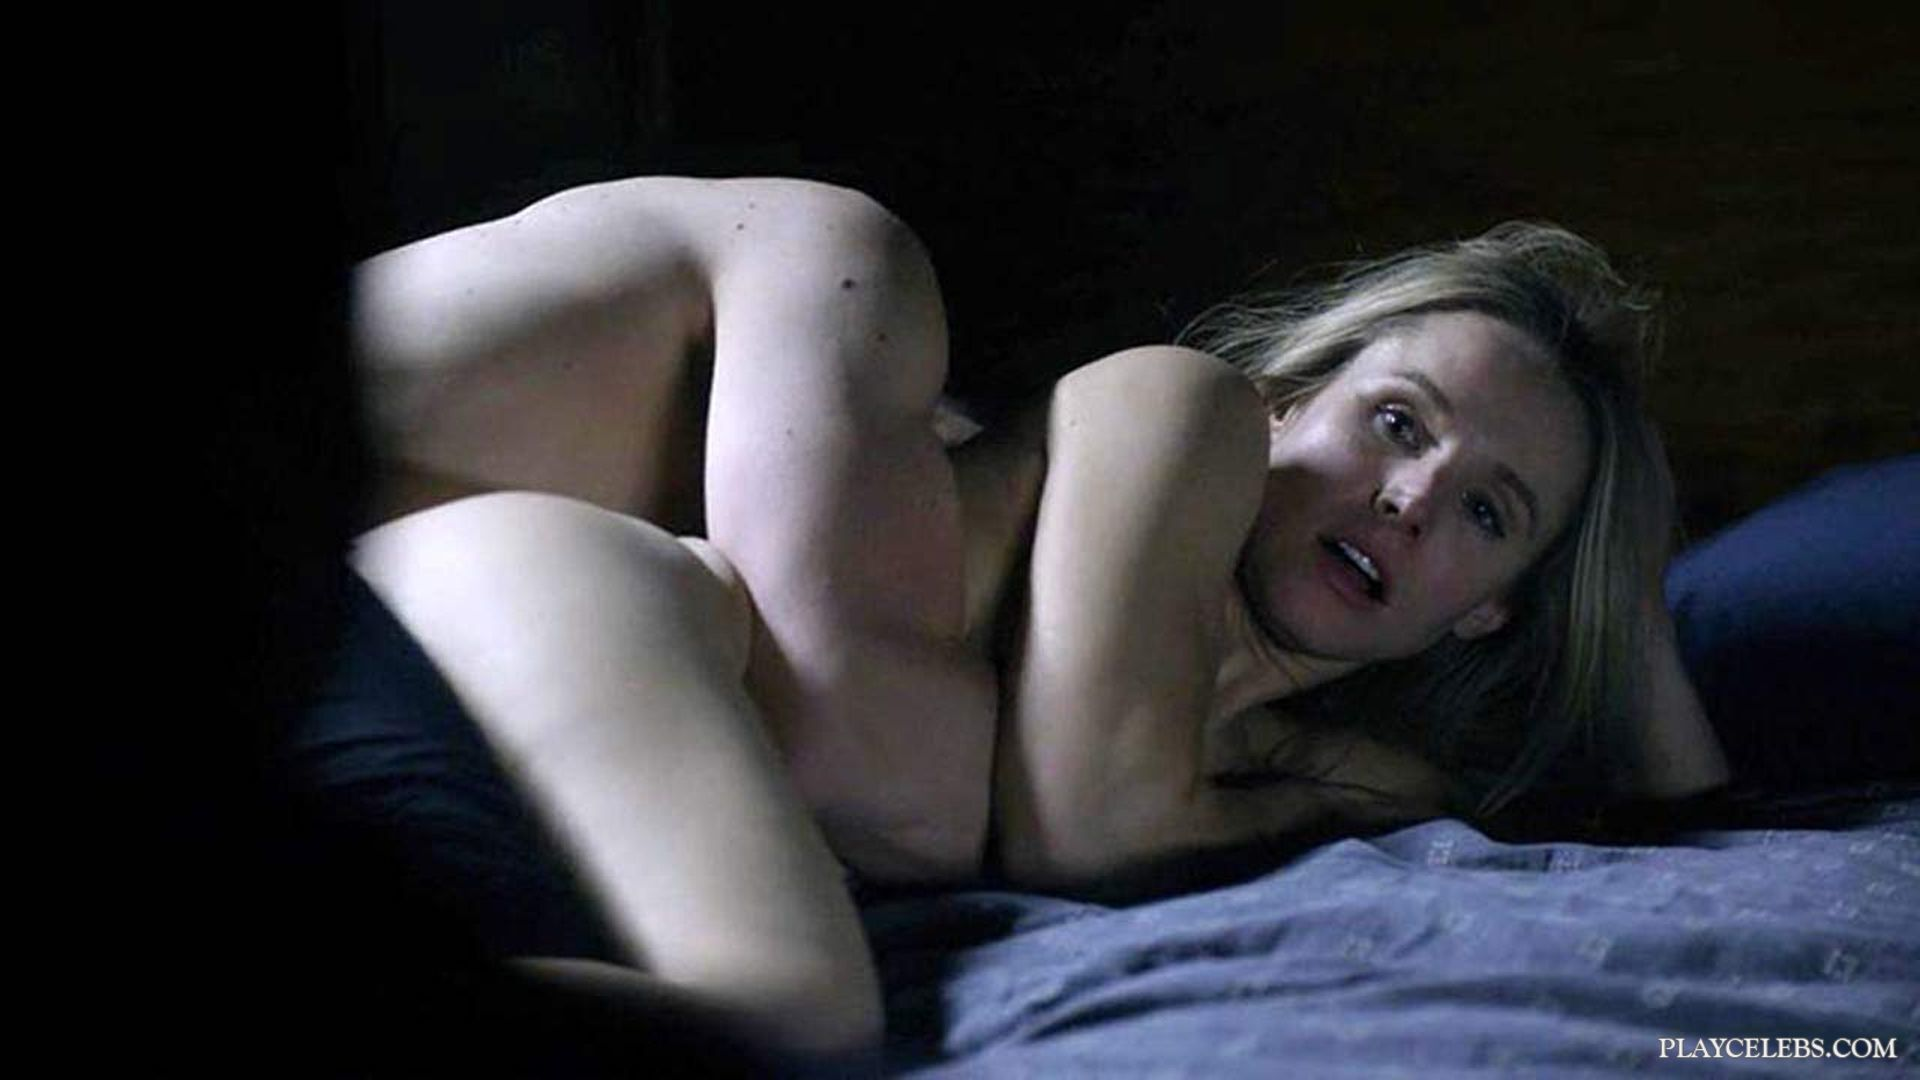 Kristen Bell Nude And Erotic Scenes In Veronica Mars (2019) S04E07